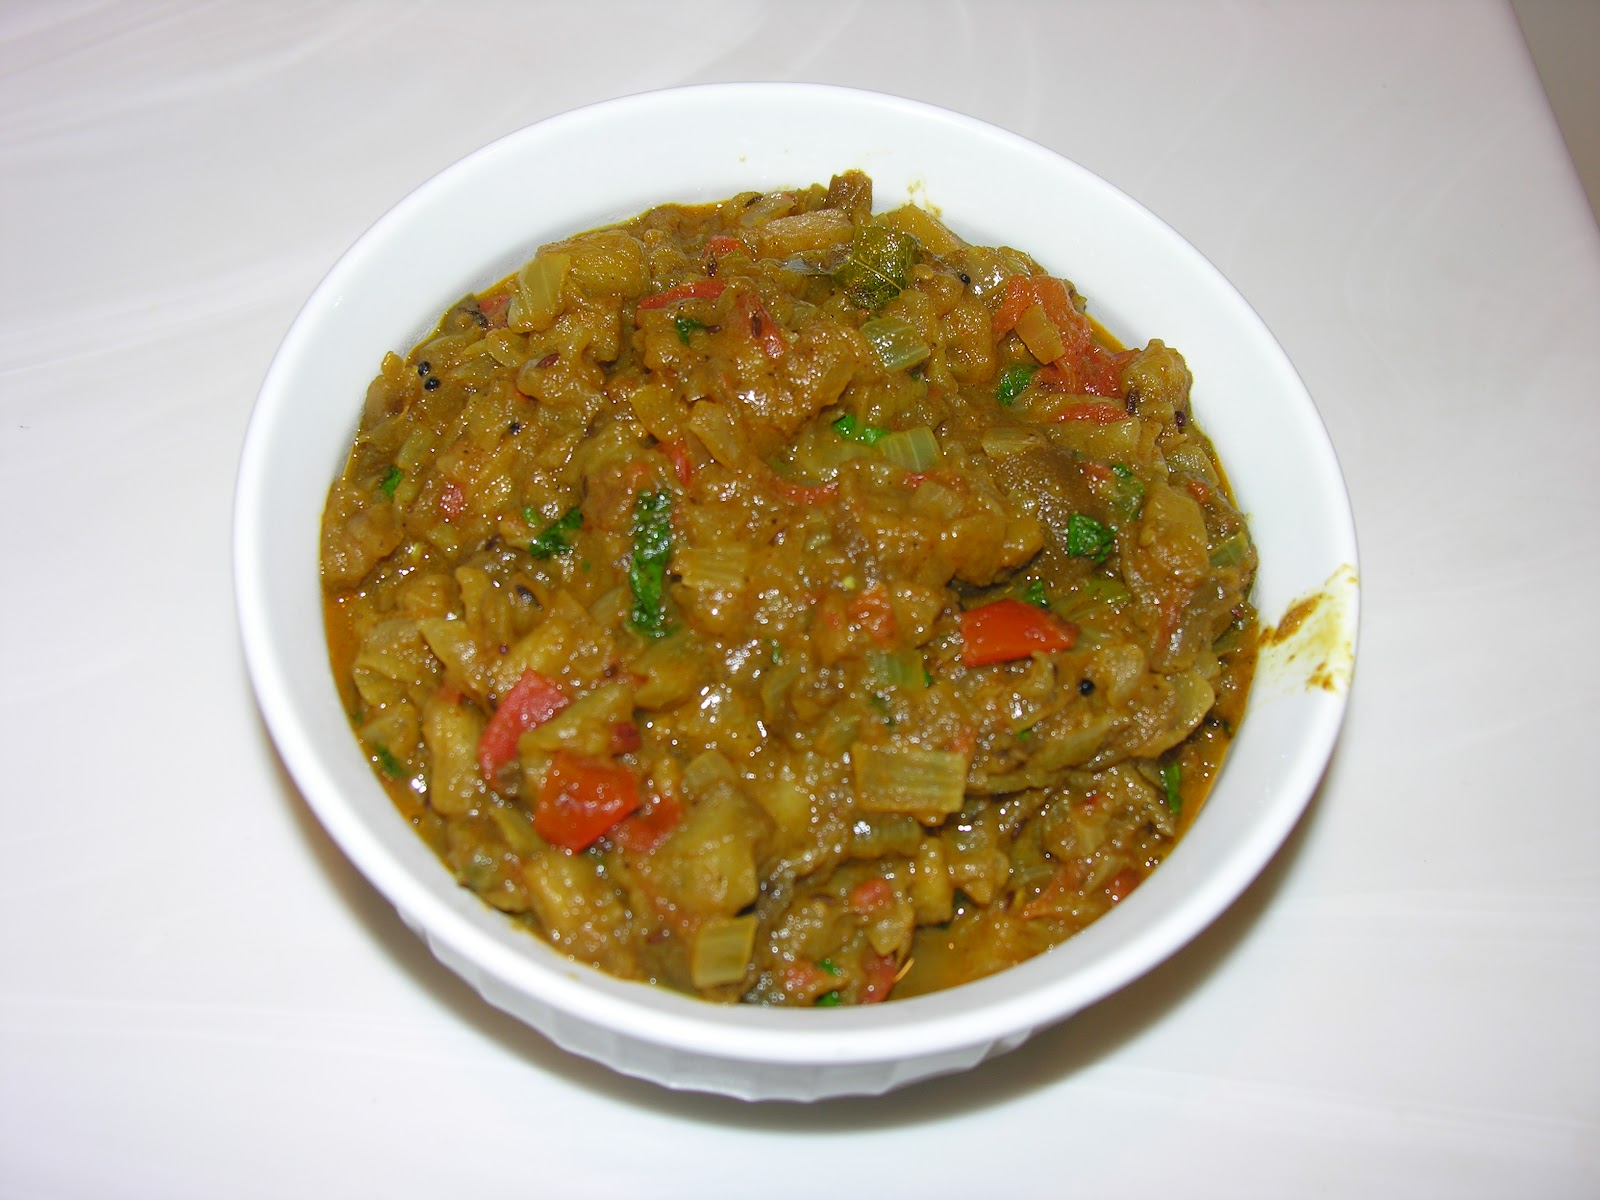 ShaRach cooking: Baingan Bharta (Eggplant curry)